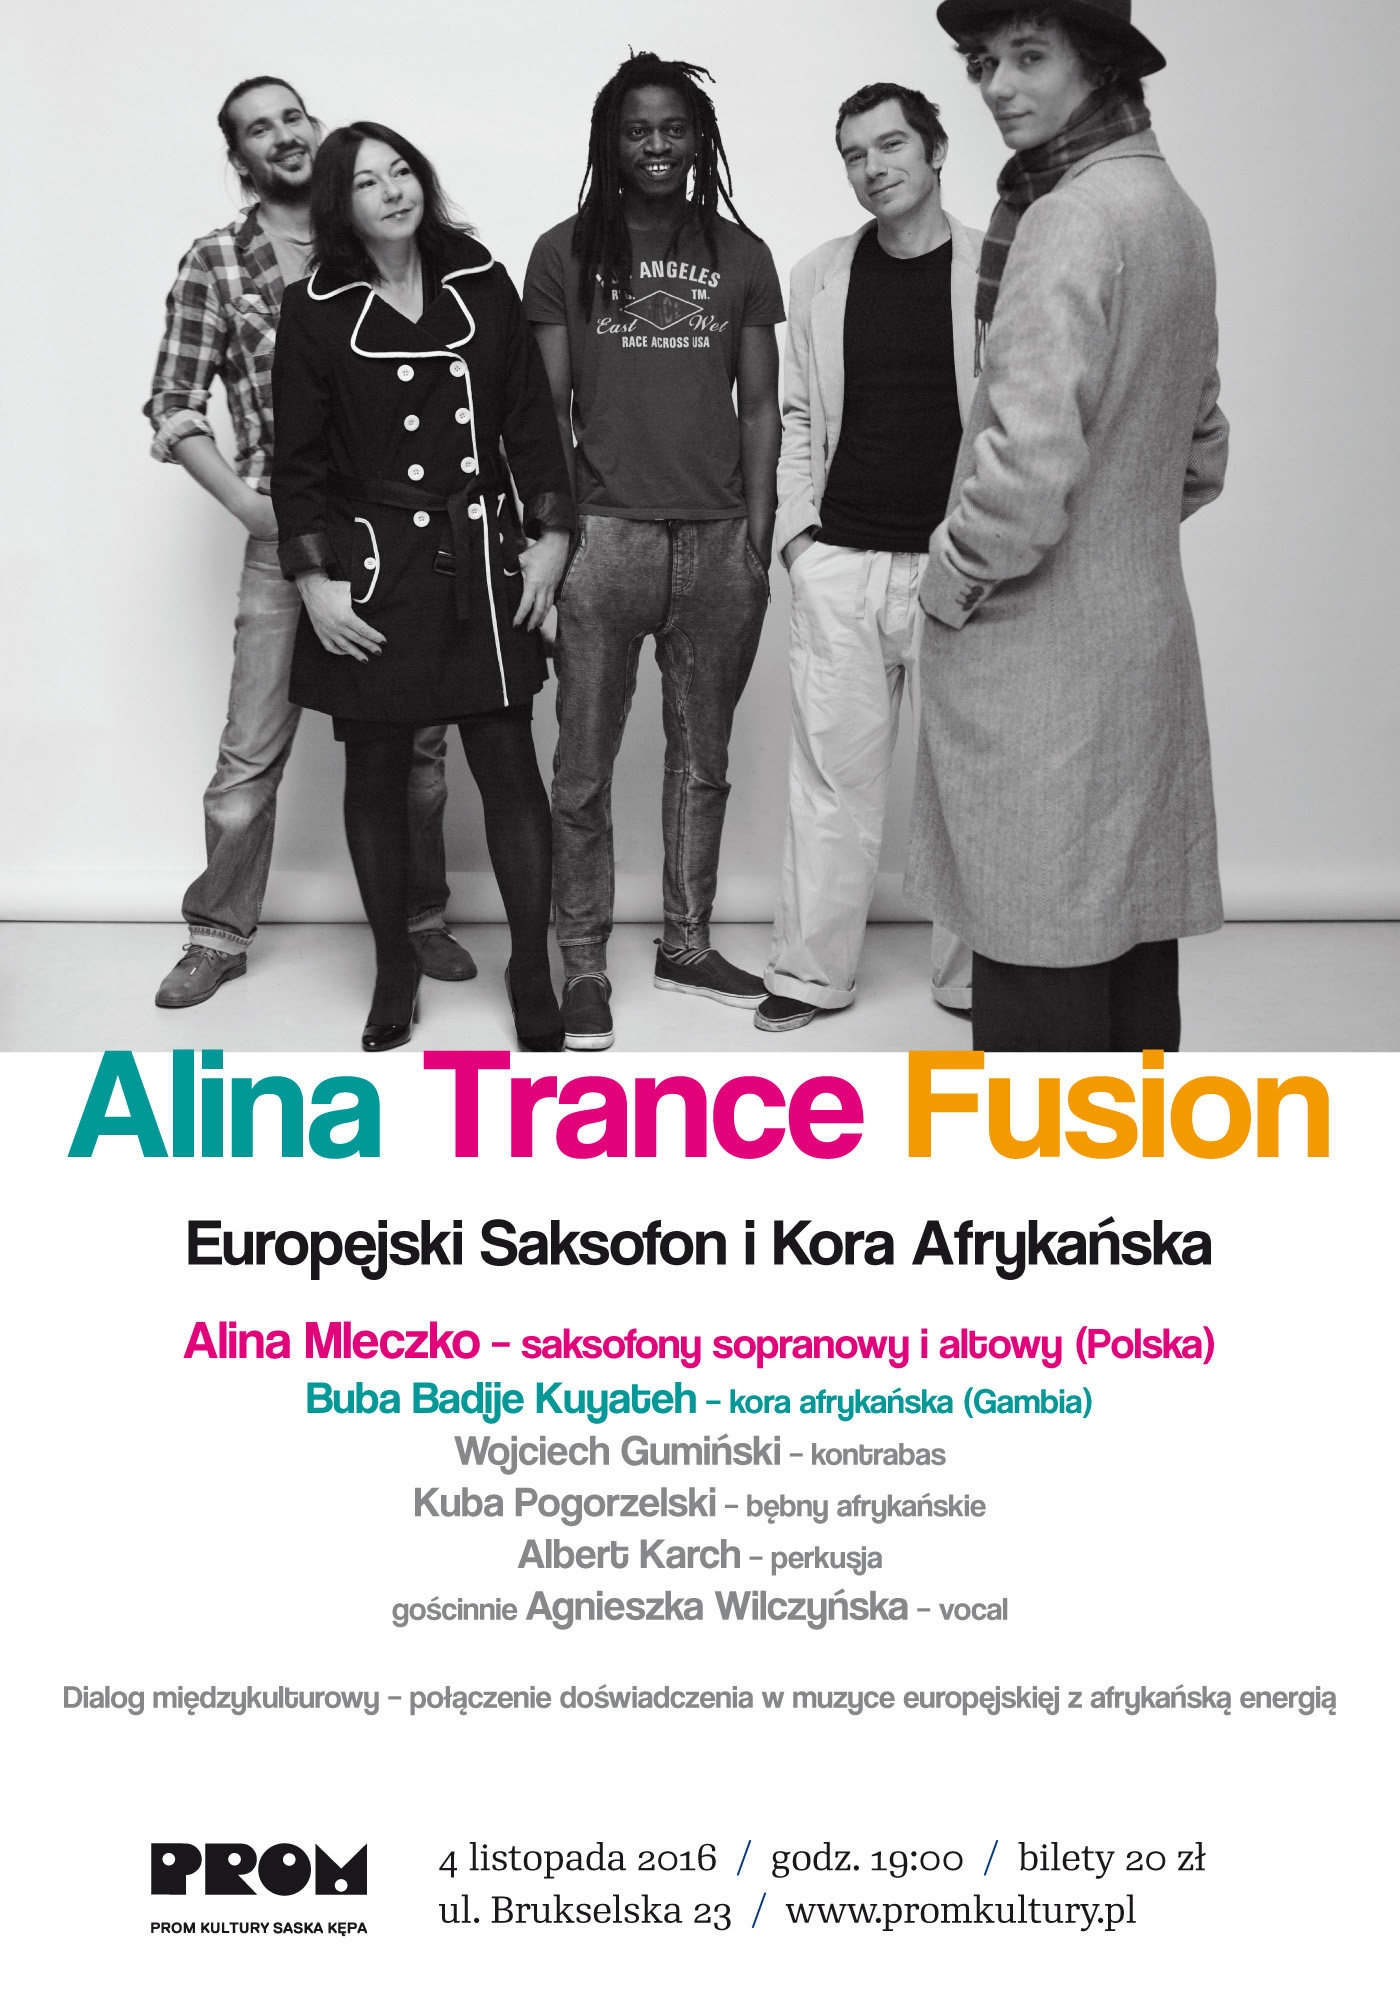 Alina Trance Fusion (źródło: materiały prasowe organizatora)